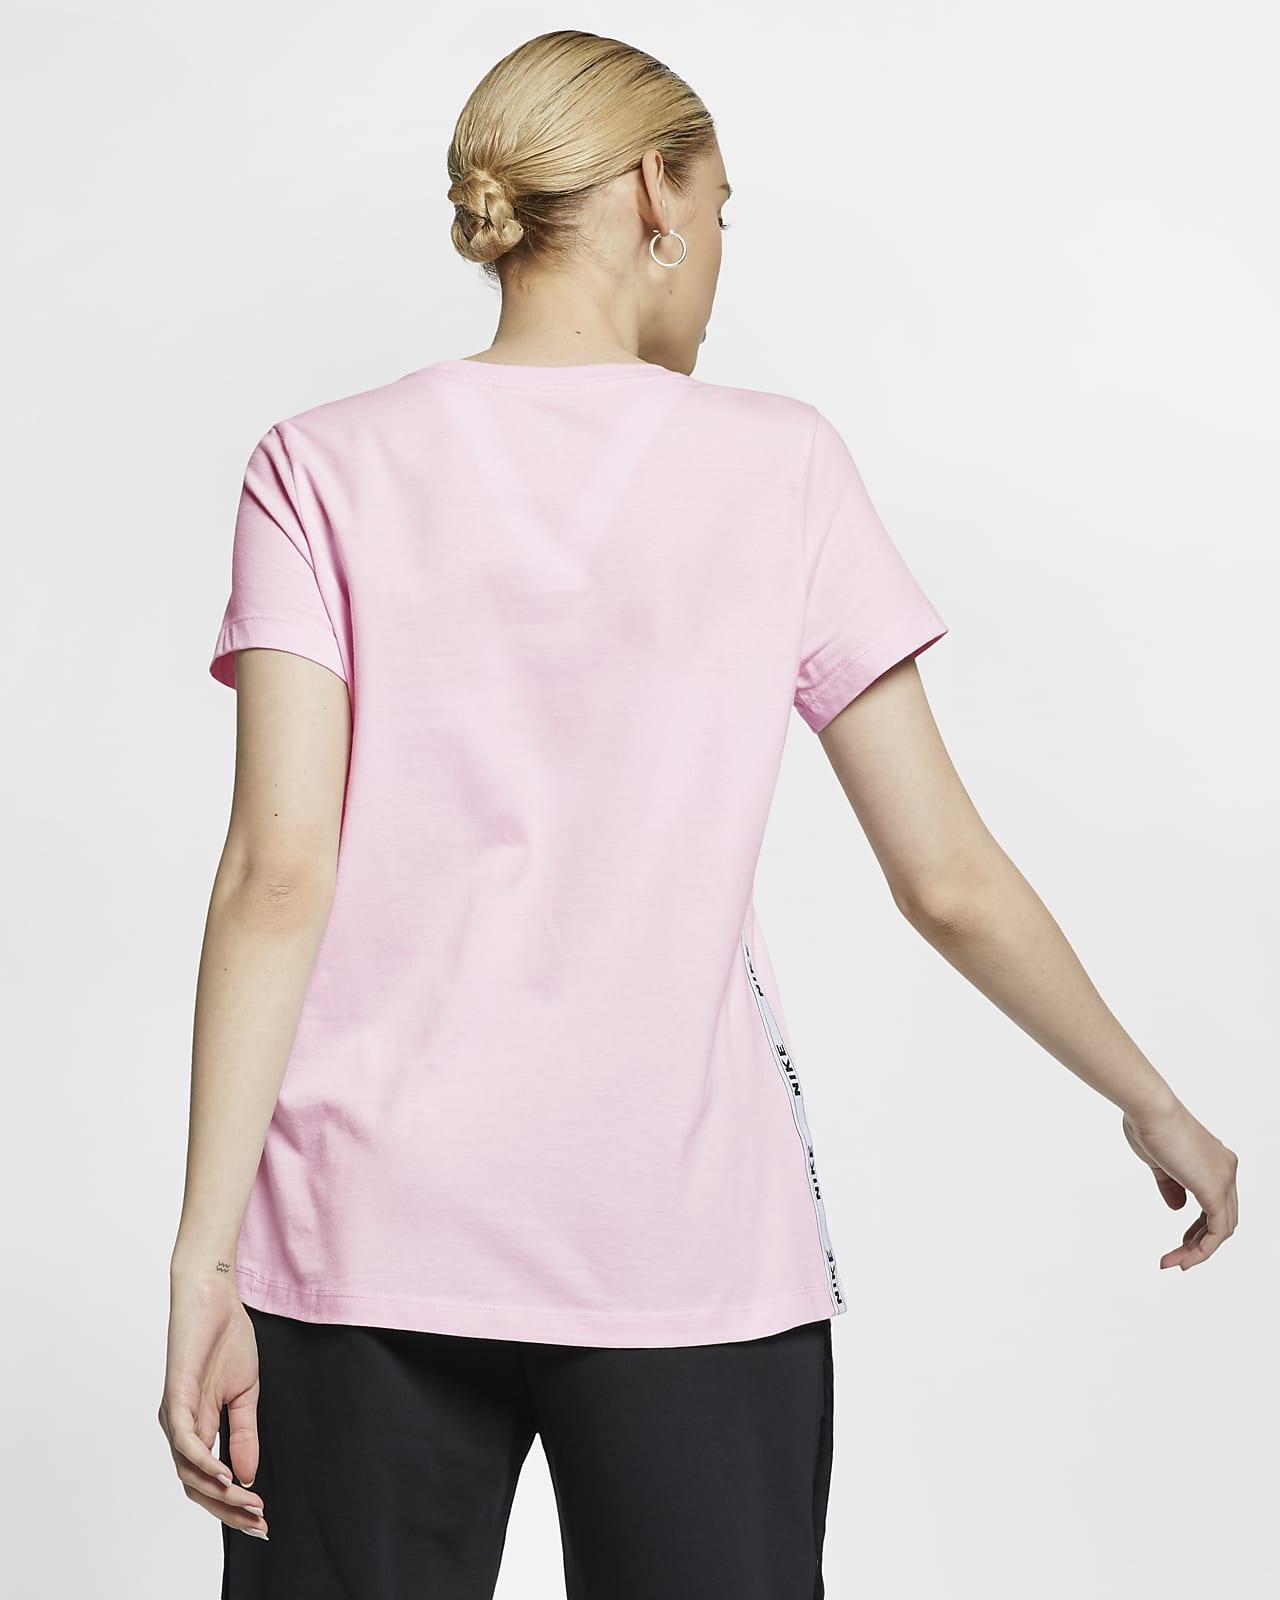 Nike Sportswear Women's Logo T-Shirt